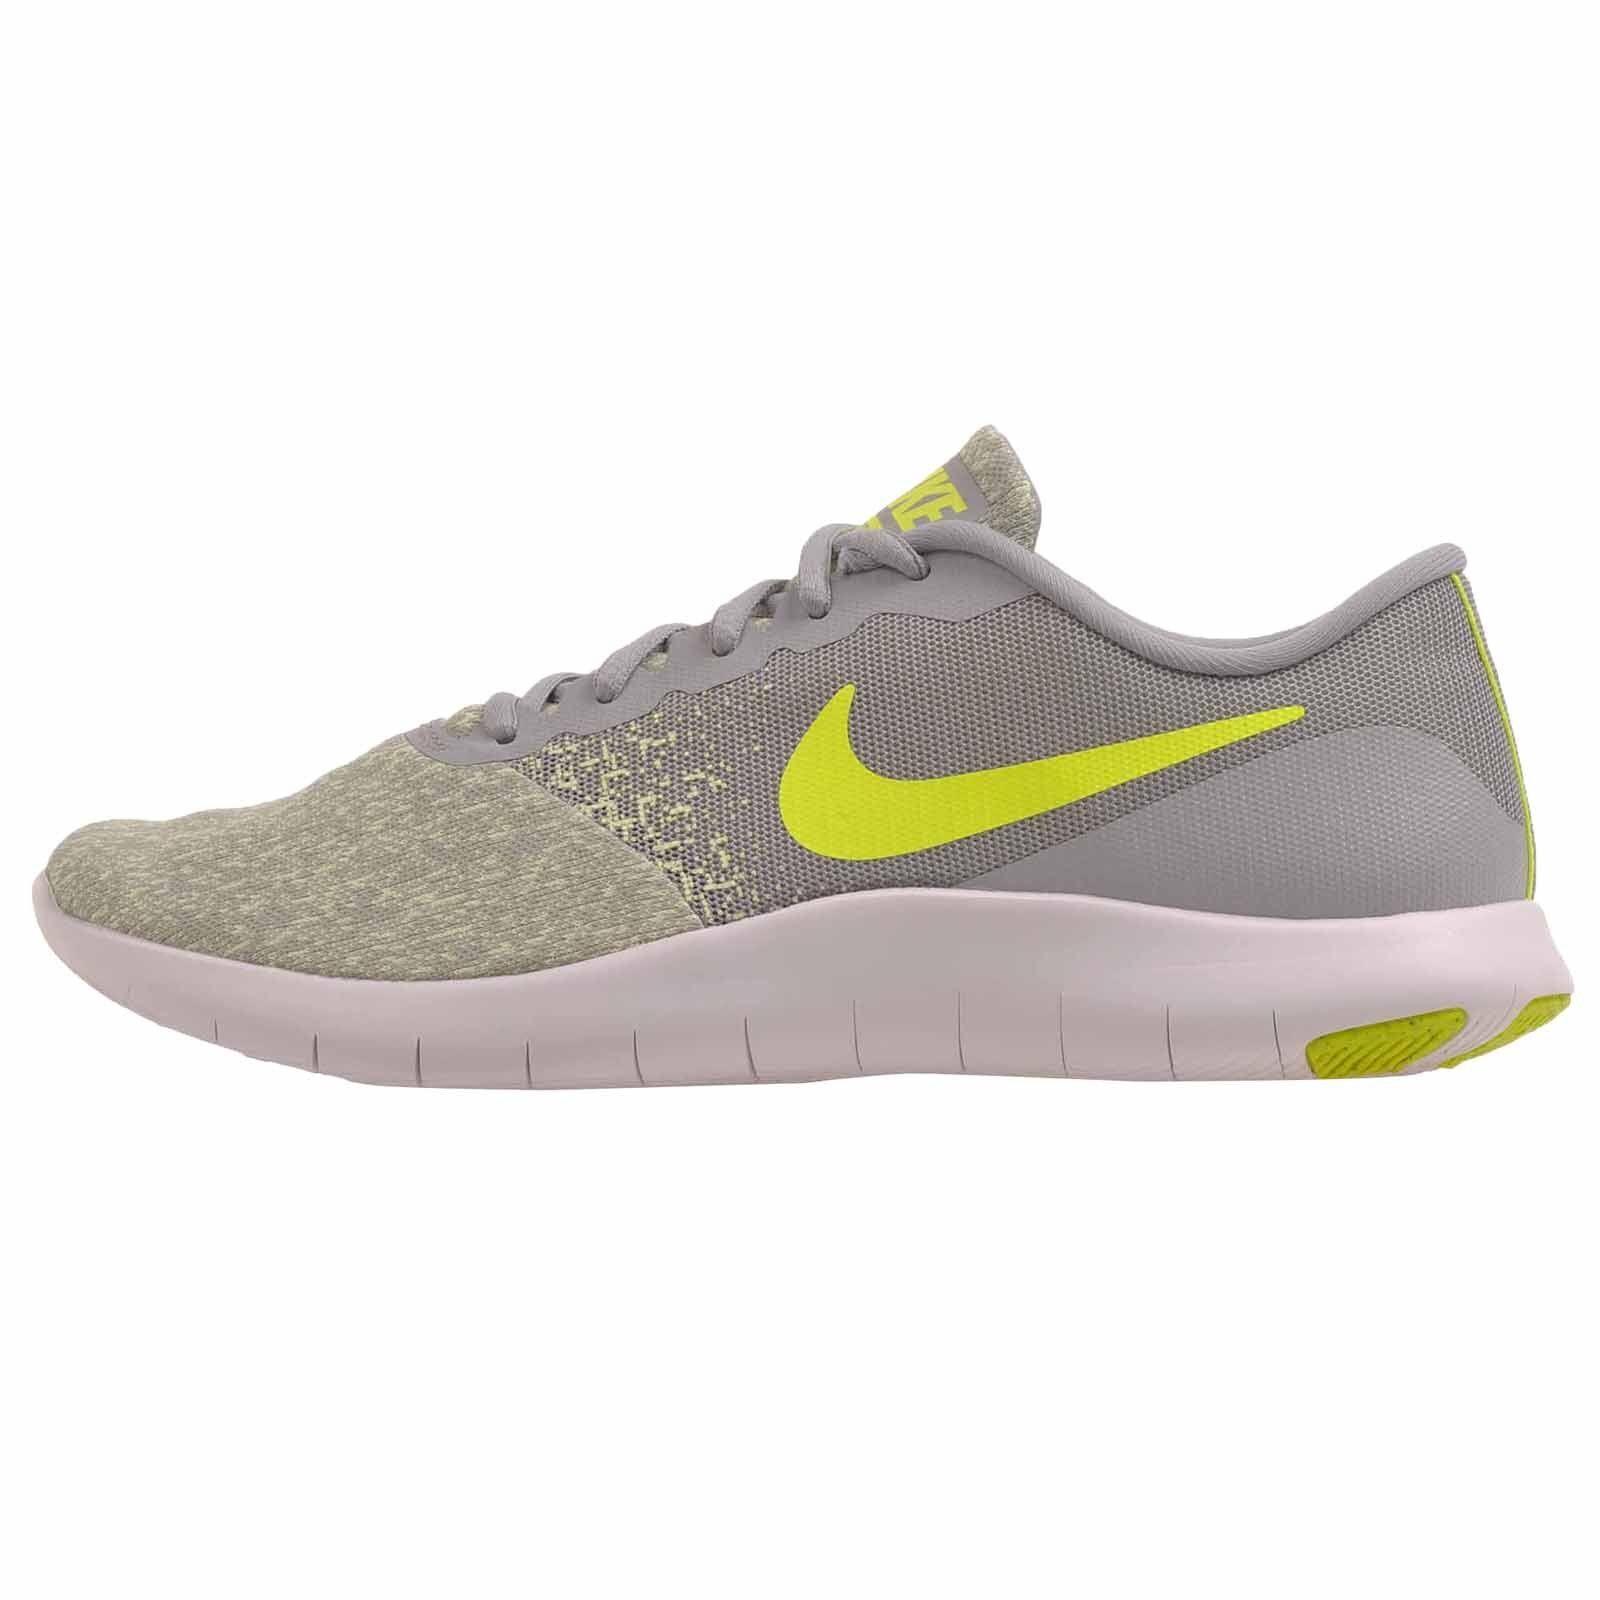 NIKE Women's Flex Contact Running Shoe Wolf Grey/Volt-barely Volt 8 B(M) US